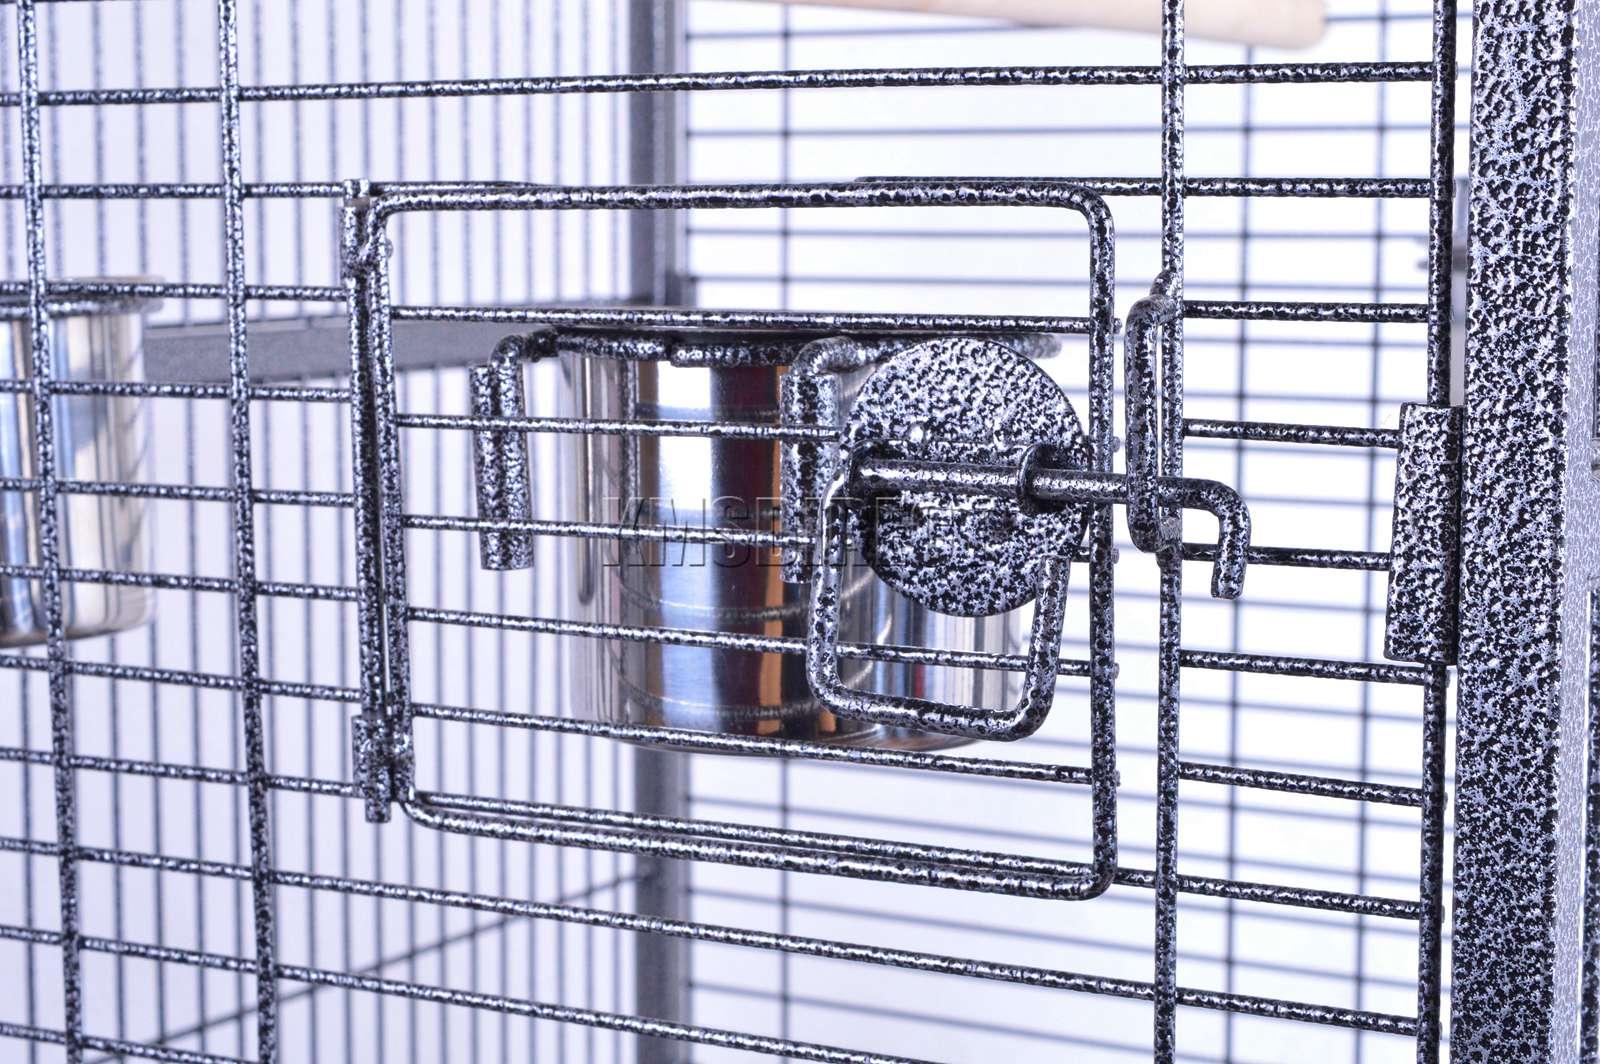 121998112507 2475 I 225 26 BIRD CAGE METAL MBC 01 HAMMERED SILVER KMSWM0808 - Foxhunter Grande Metal Jaula con Soporte Pajarera Loro Periquito Canario Cacatua